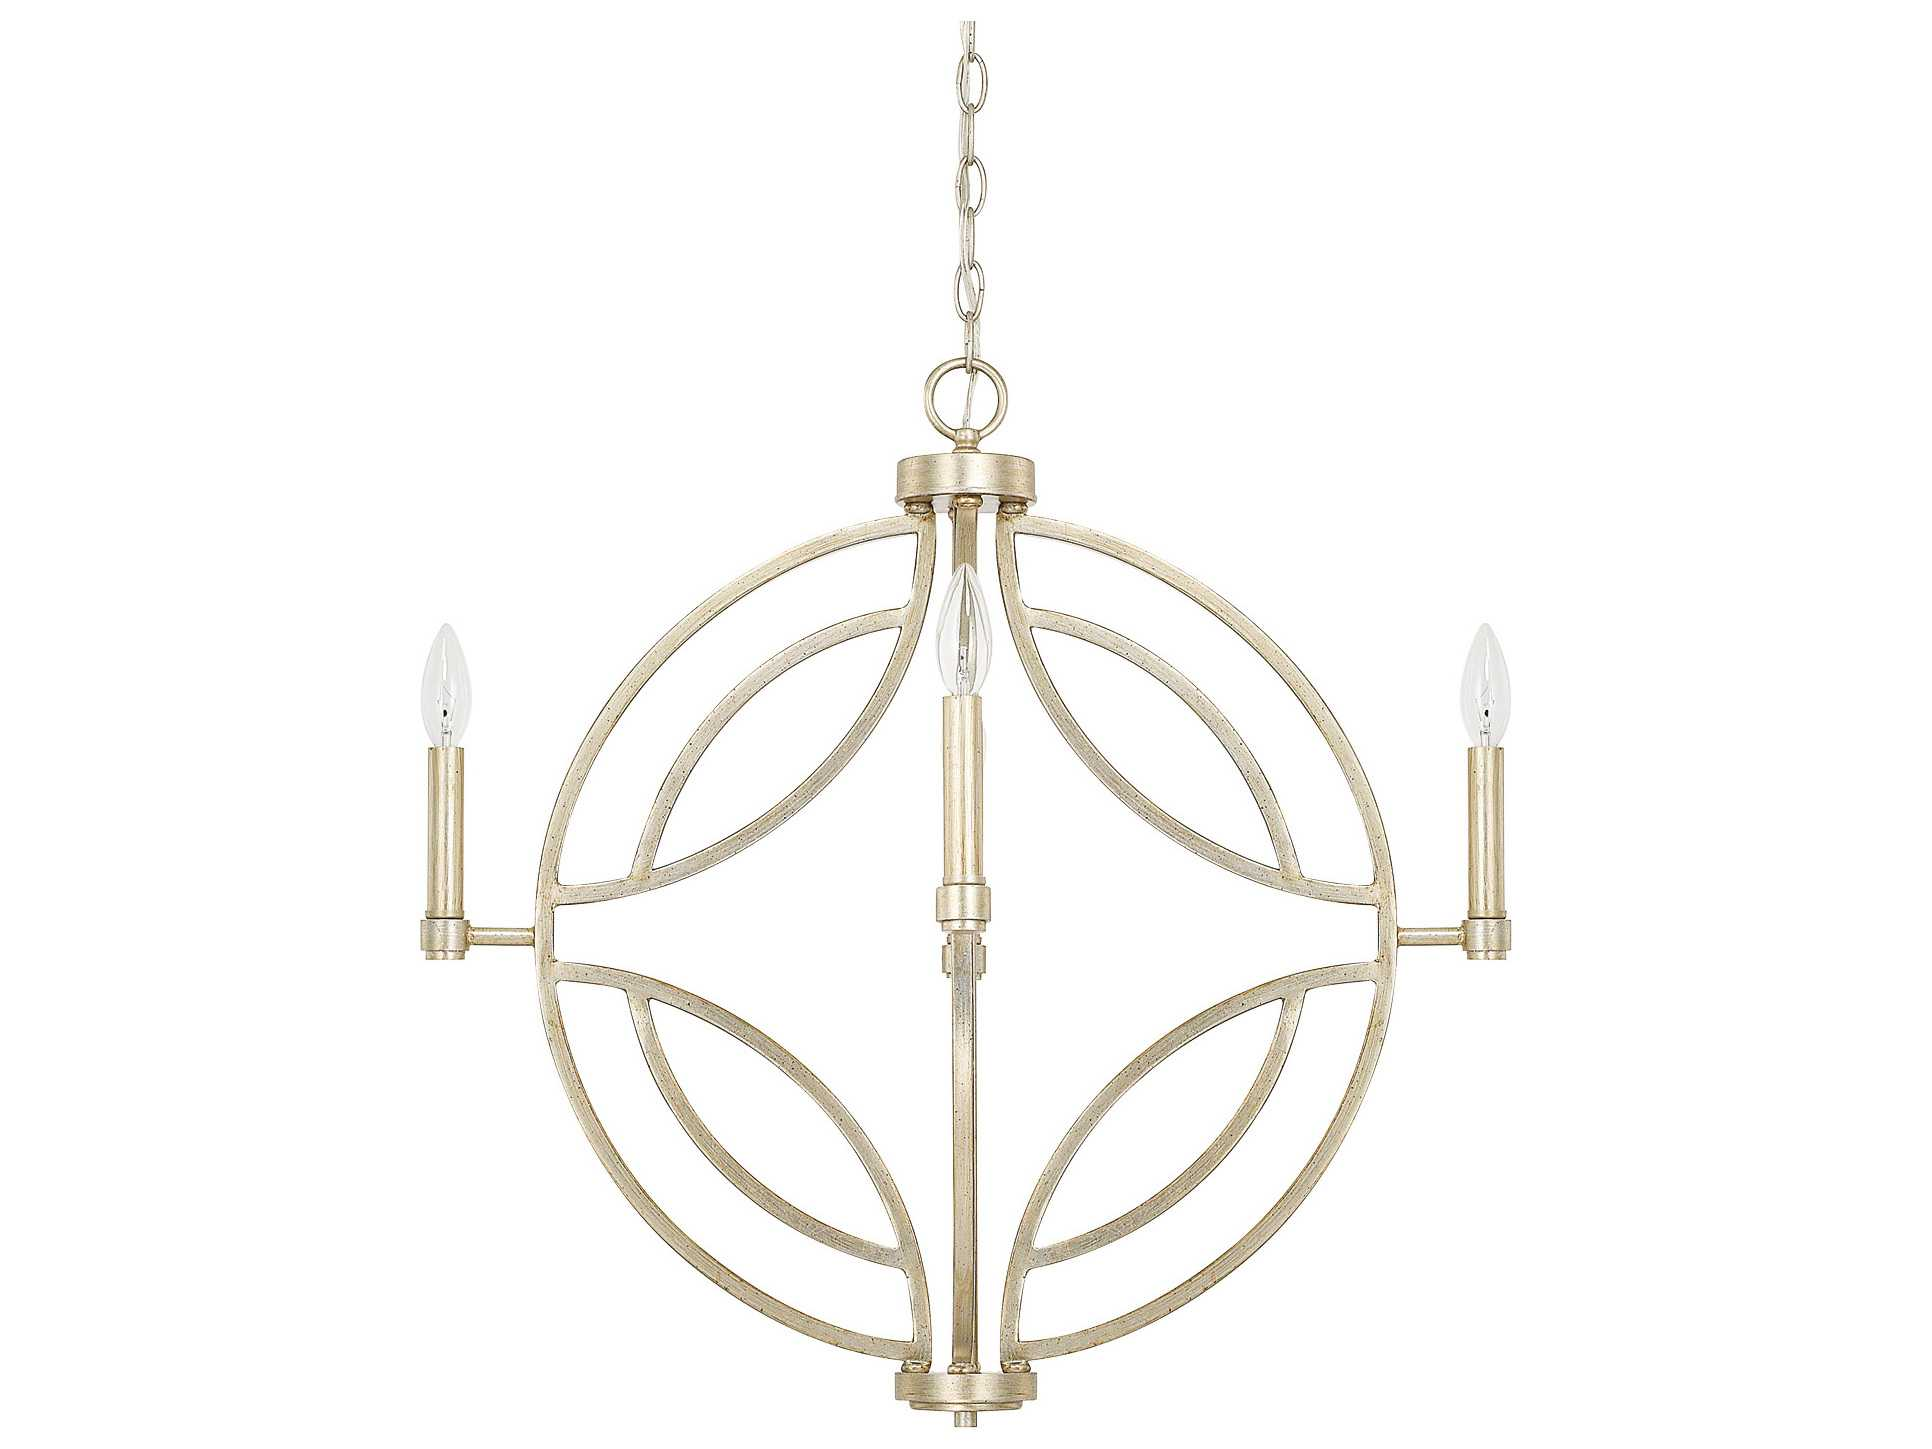 Progress Lighting Riverside Collection 4 Light Heirloom: Capital Lighting Mercer Winter Gold Four-Light 25'' Wide